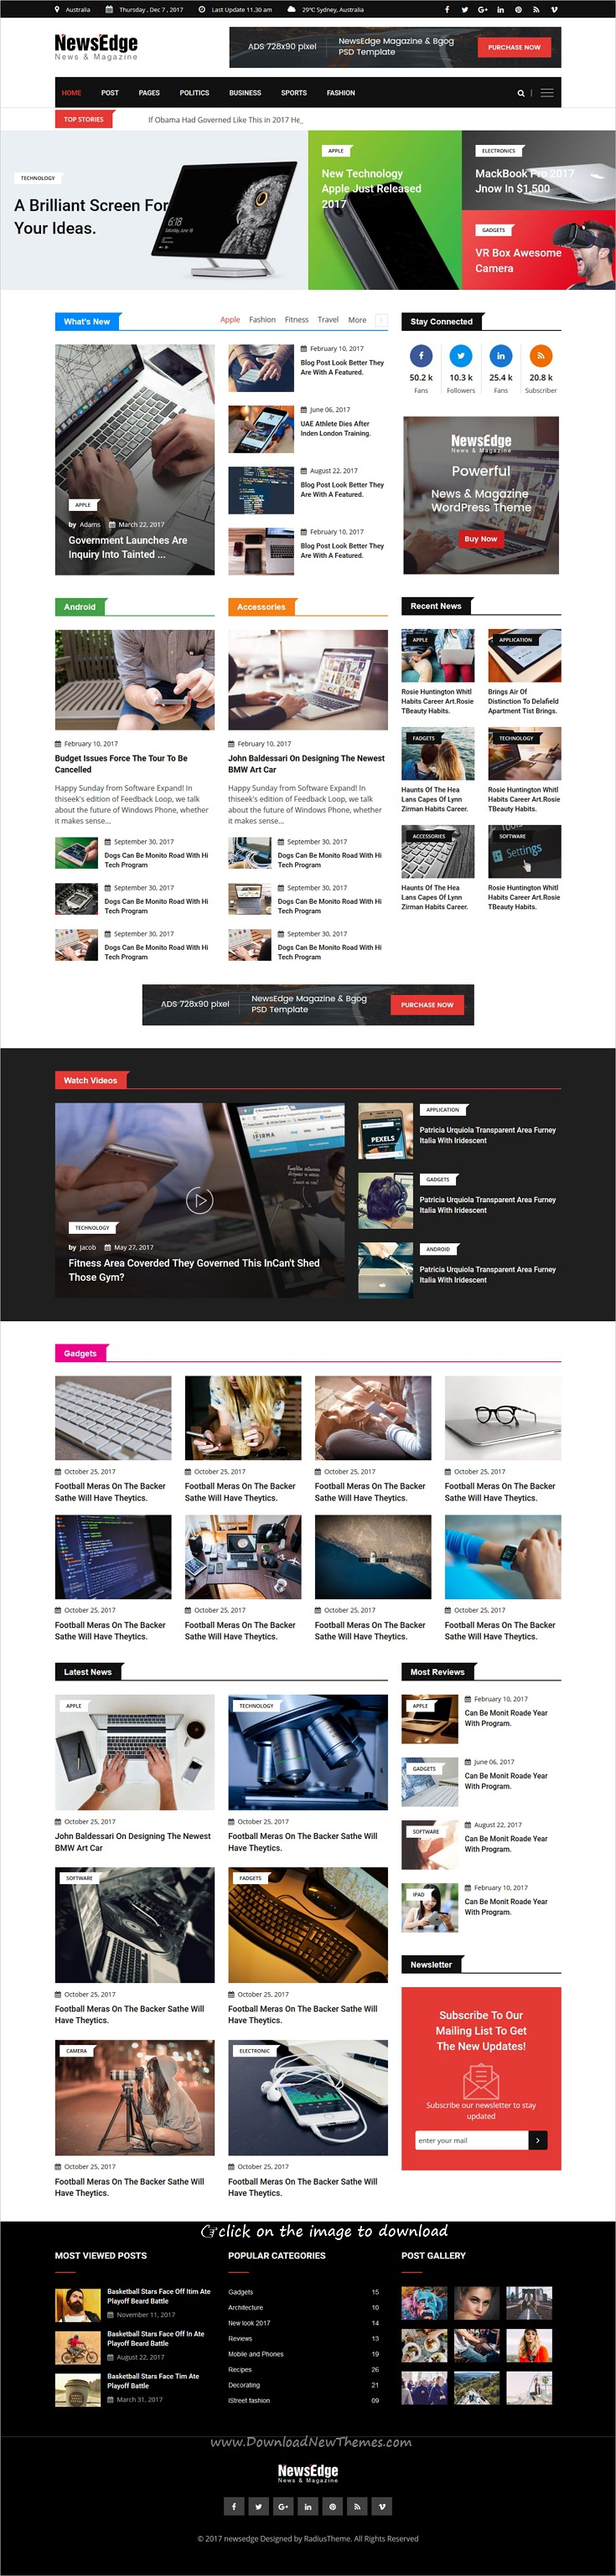 NewsEdge - News & Magazine HTML Template | Magazine website ...